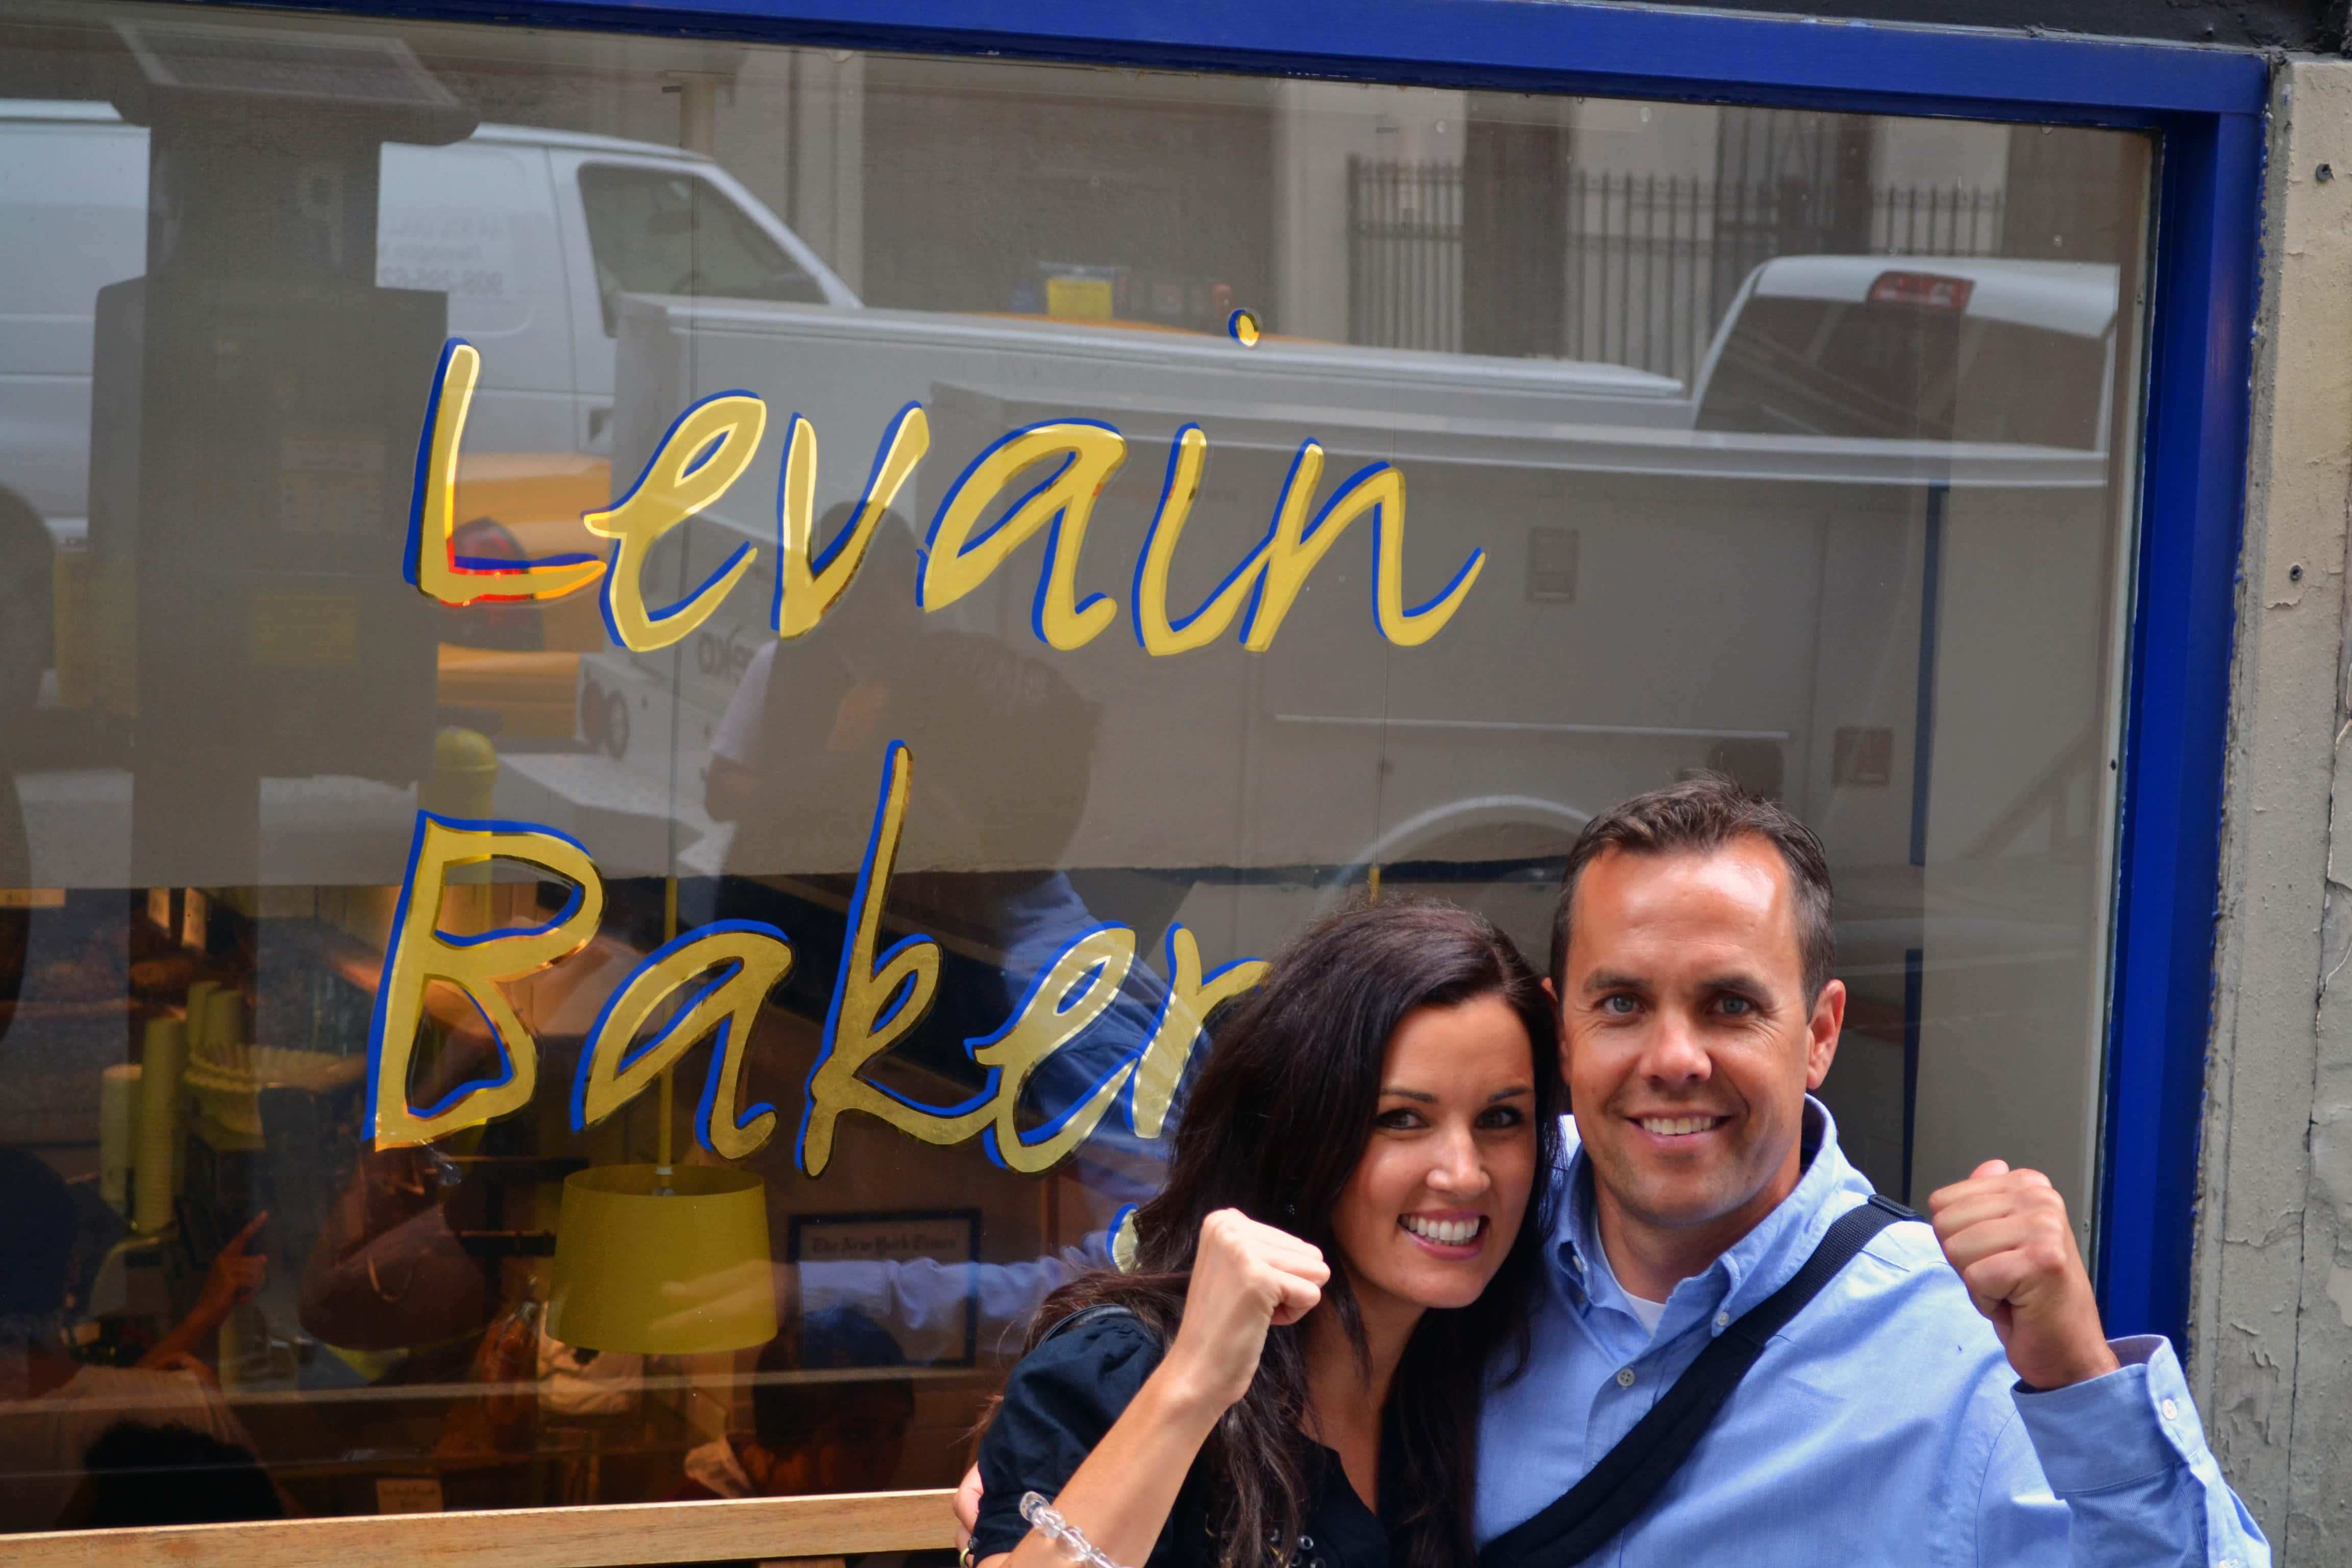 Levain Bakery, Modern Honey, Levain Bakery Chocolate Chip Cookies